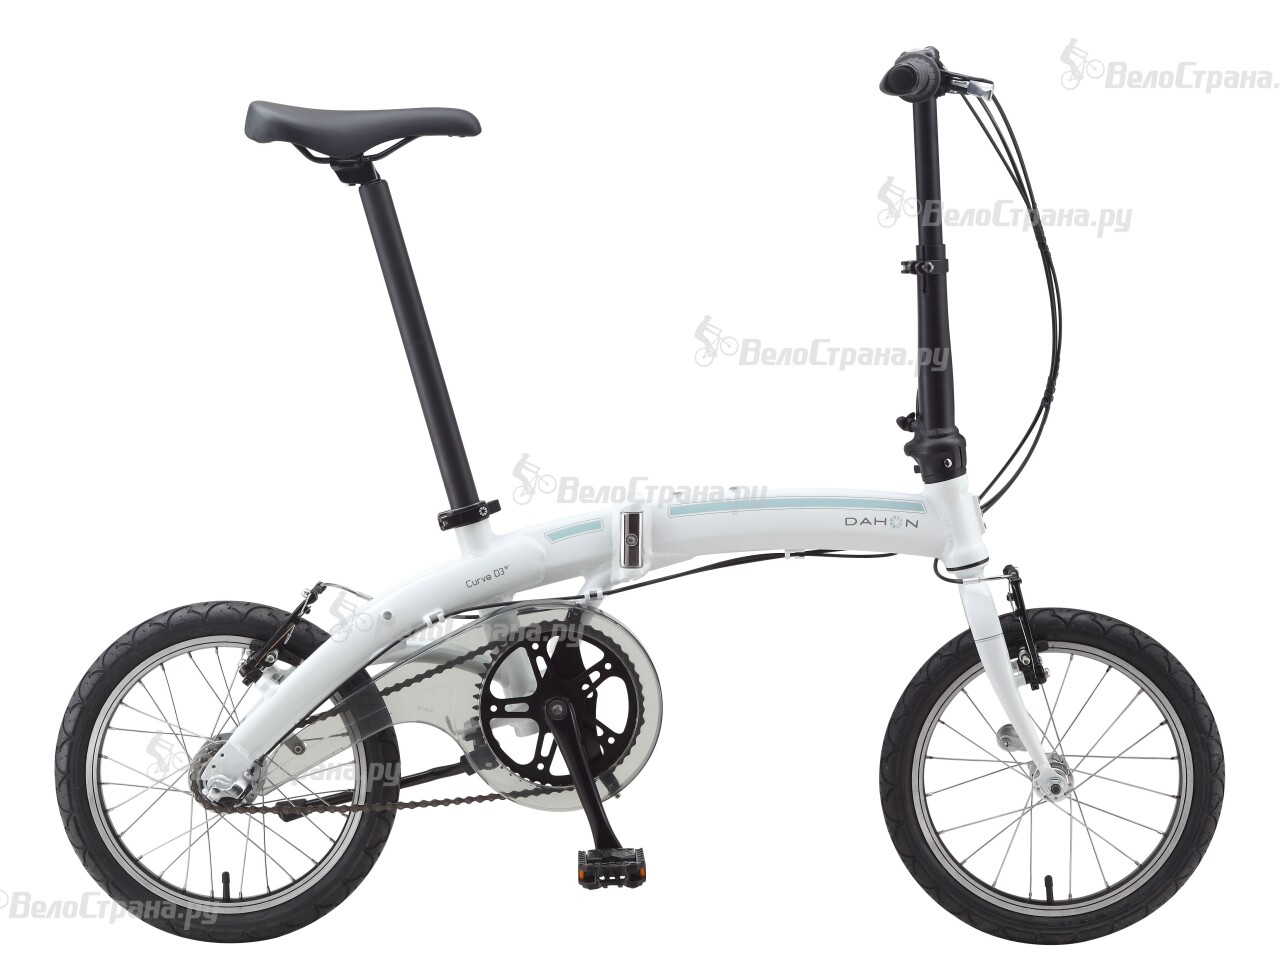 Велосипед Dahon Curve i3 16'' (2015) велосипед dahon speed d7 2015